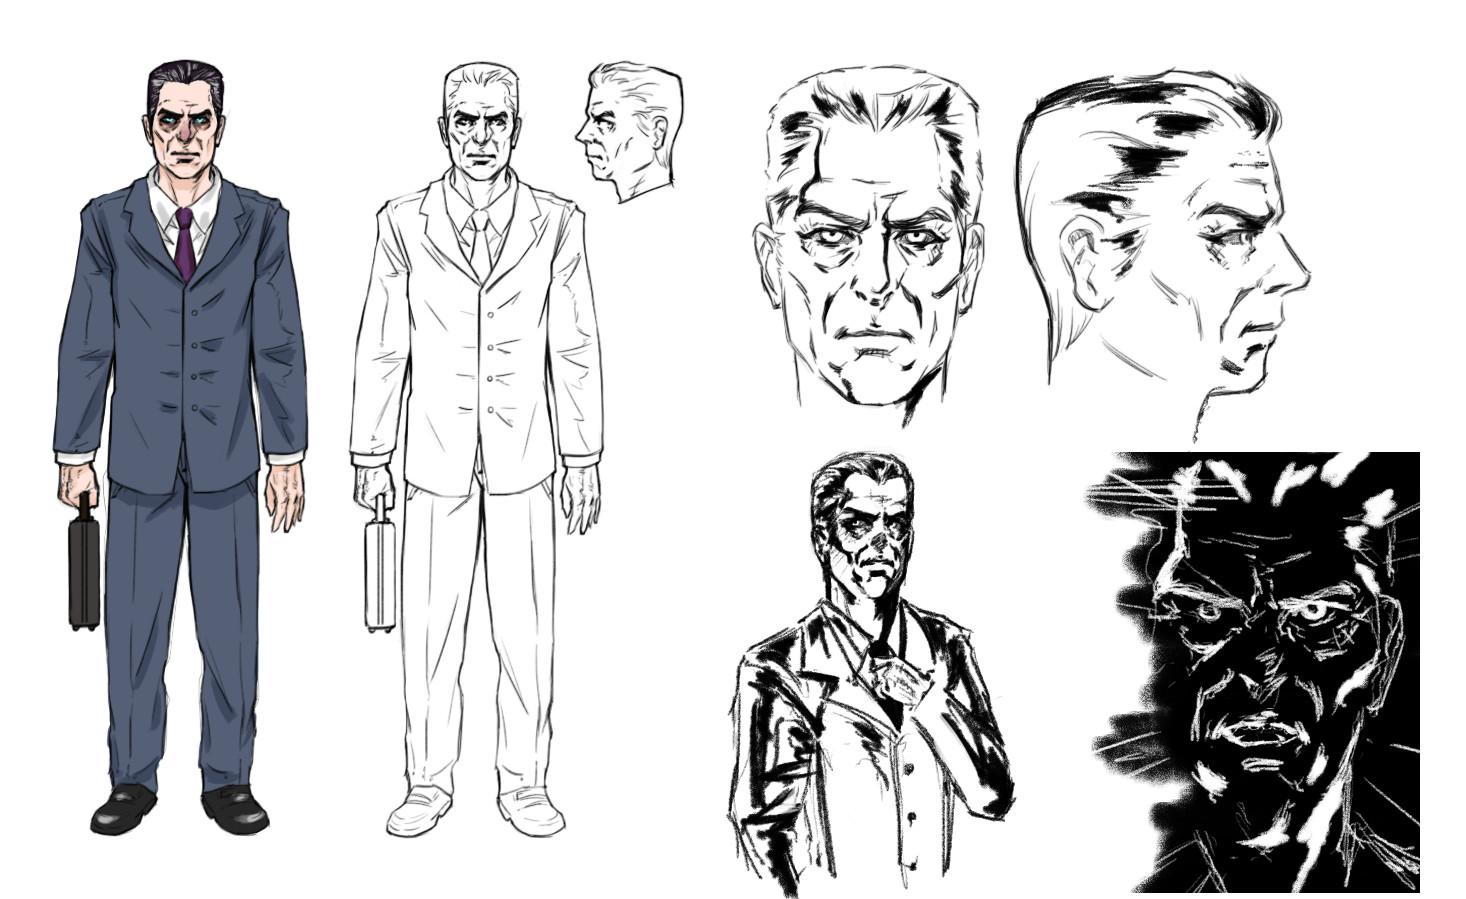 Artstation Half Life 2 Concept Arts Vitor Hugo Watson Trajano